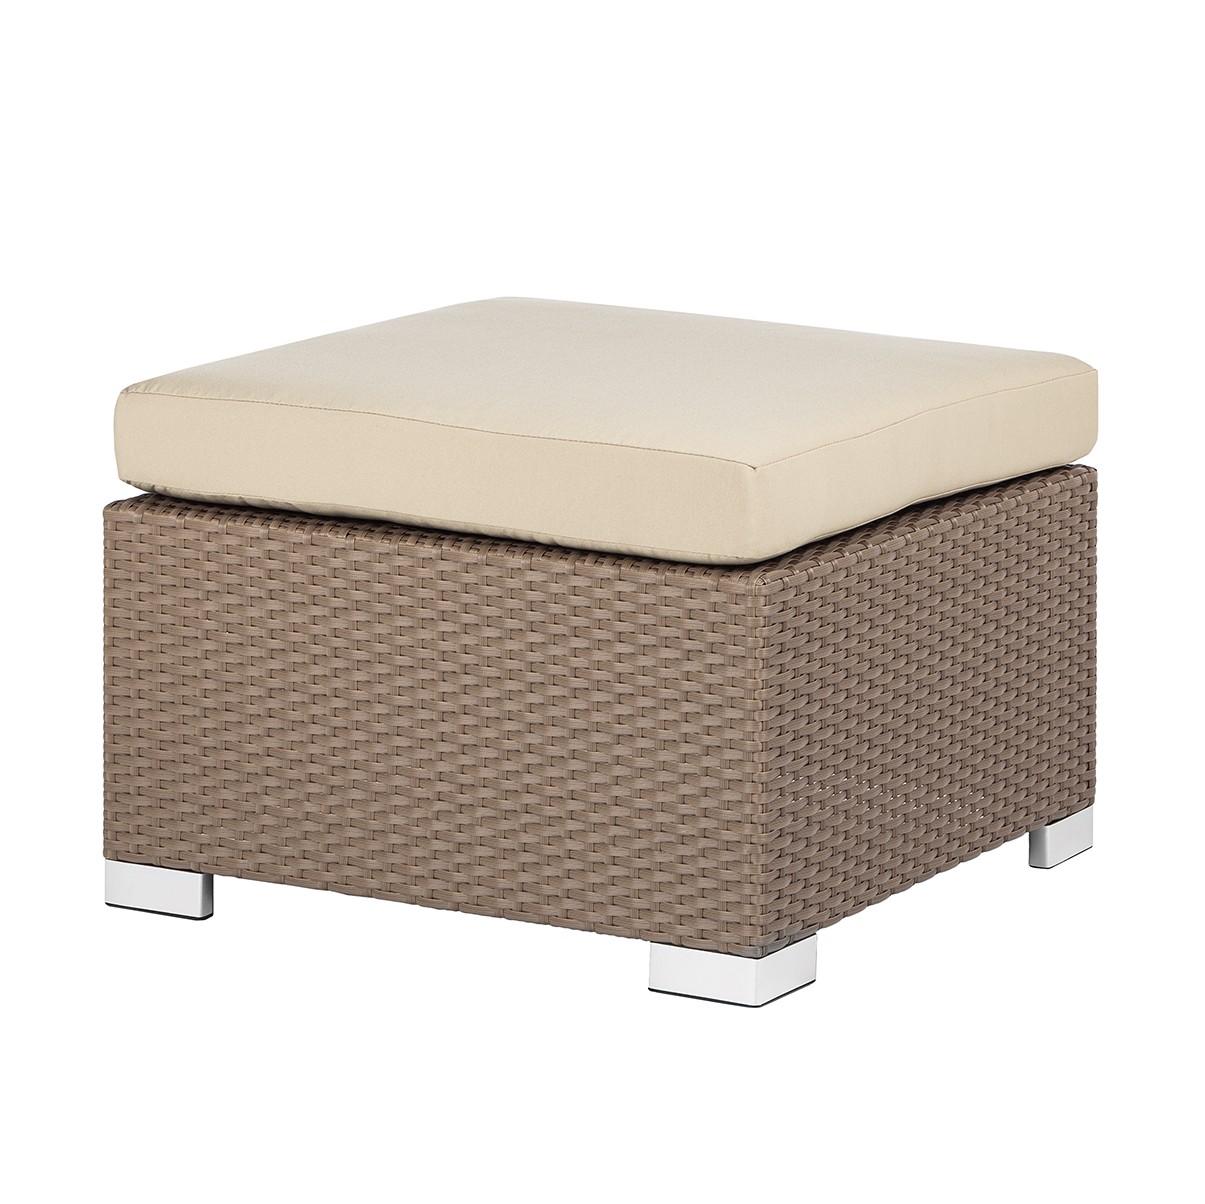 hocker facil polyrattan cappuccino kings garden online. Black Bedroom Furniture Sets. Home Design Ideas